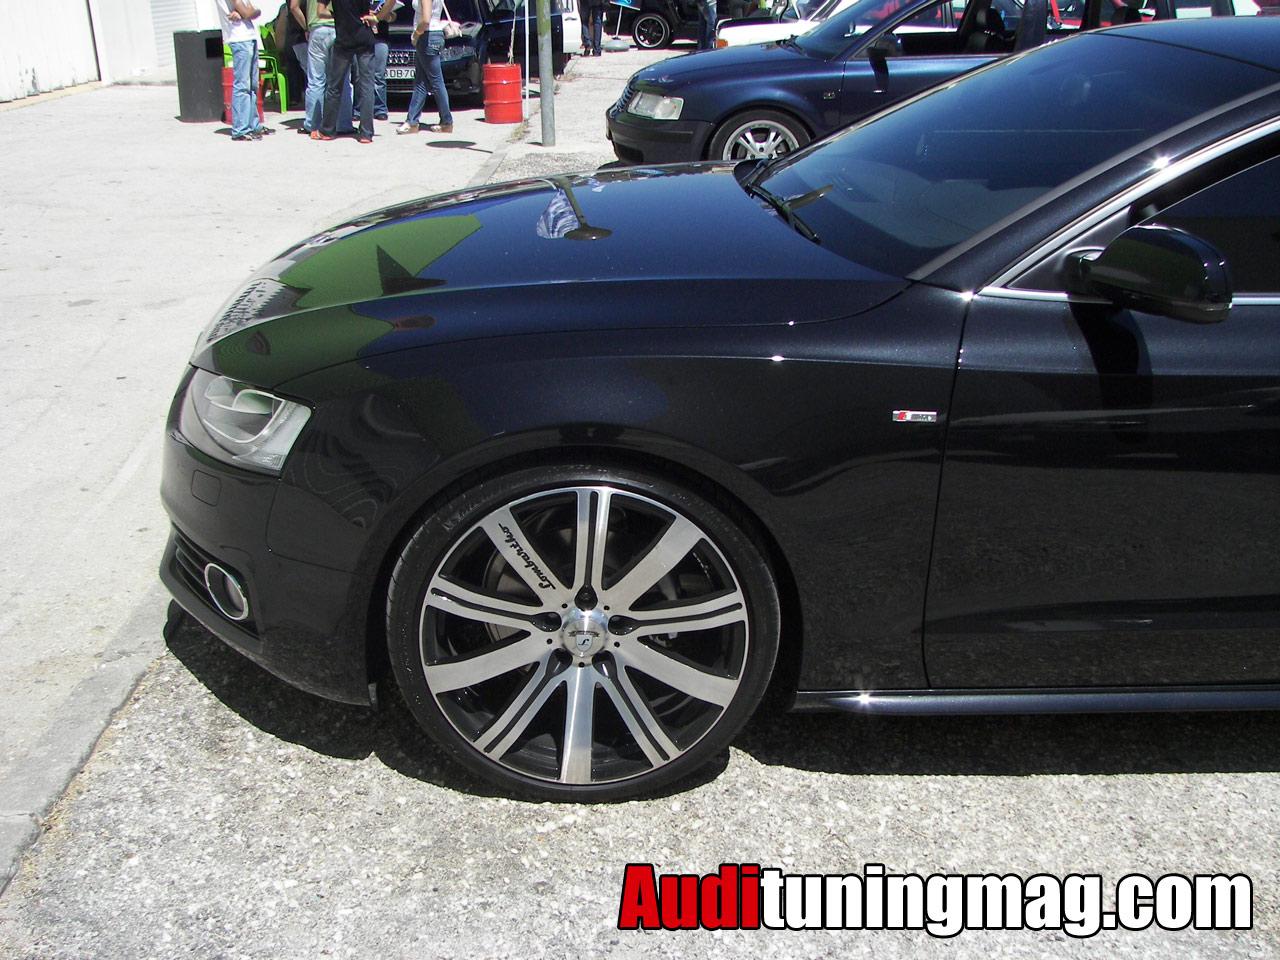 audi-a5-sline-lamborghini-wheels-3